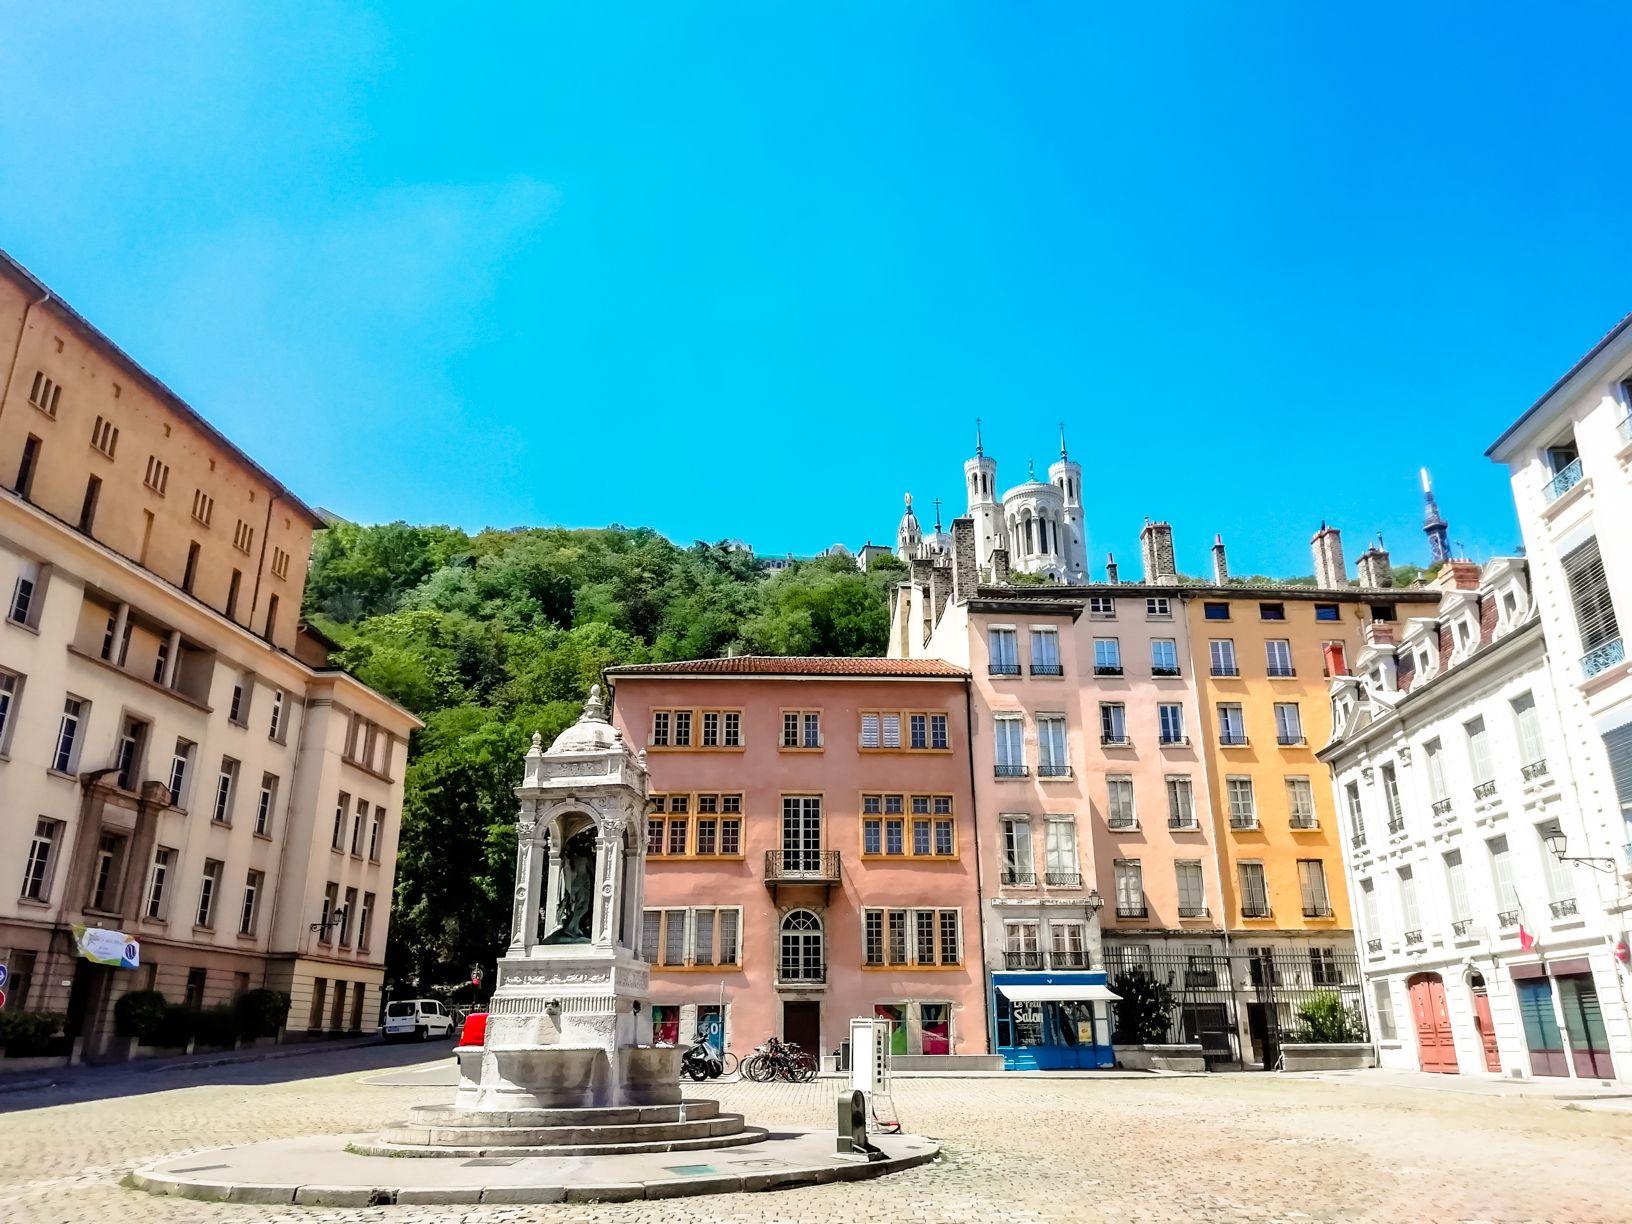 Vieux-Lyon district | Short travel guide to Lyon, France | FinnsAway Travel Blog